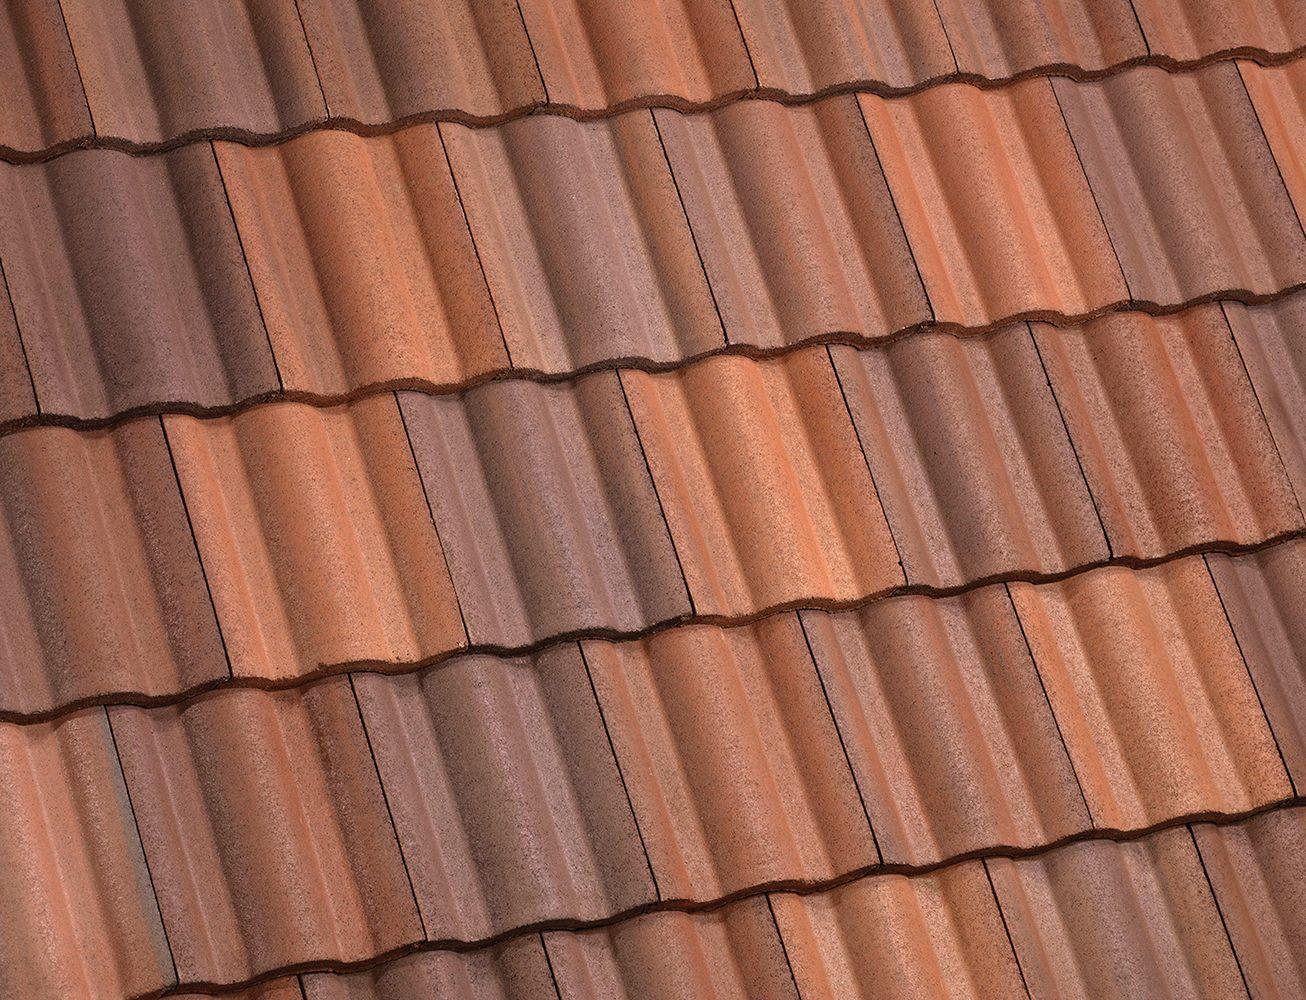 Scm 8830 Malibu Albuquerque Blend Concrete Roof Tiles Roofing Options Roofing